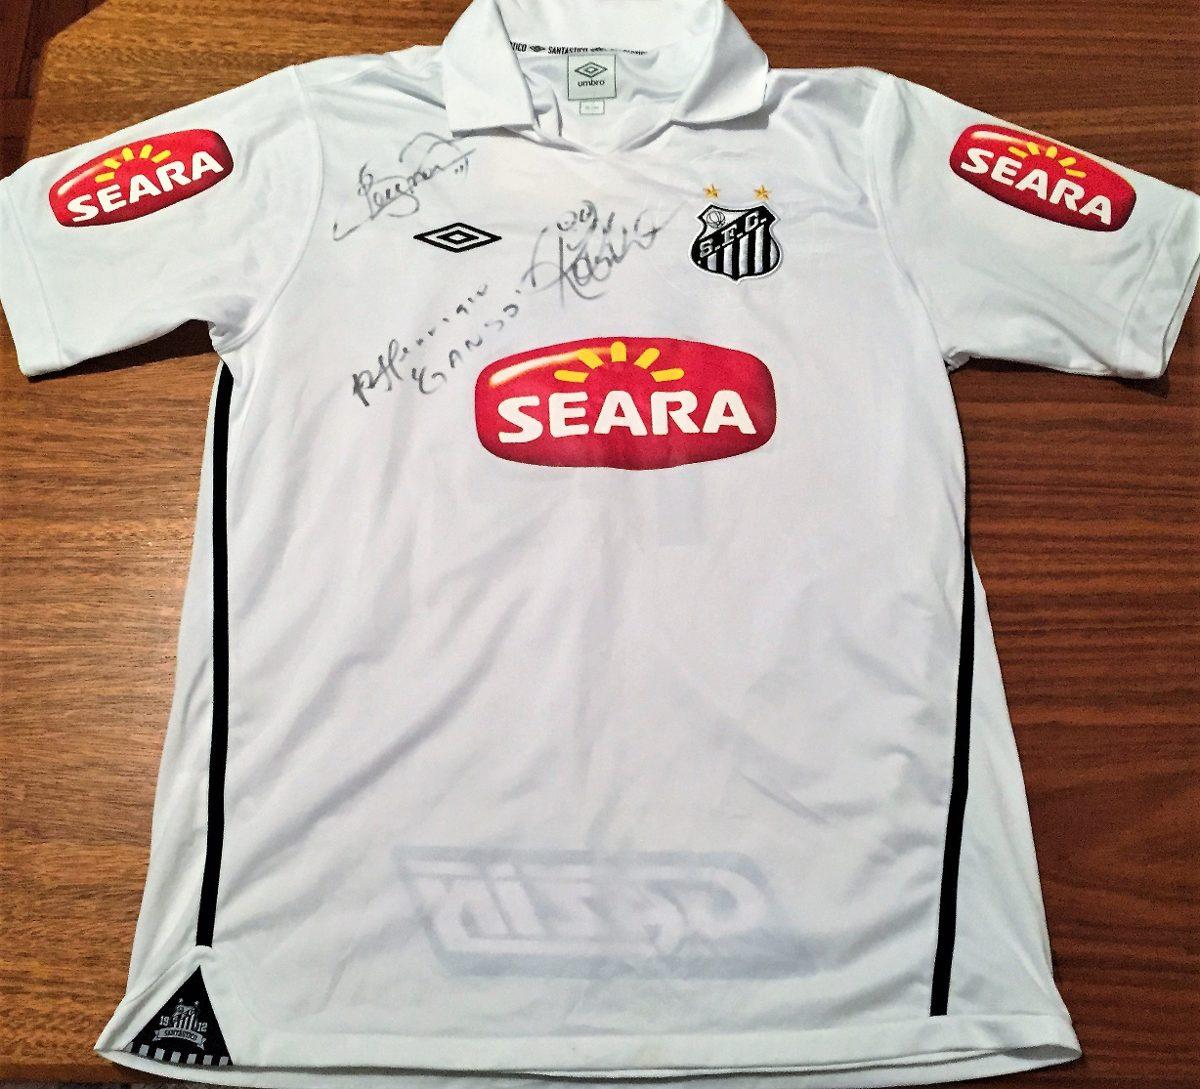 fcdbf044d7 Camisa Santos 2010 De Jogo Assinada Neymar